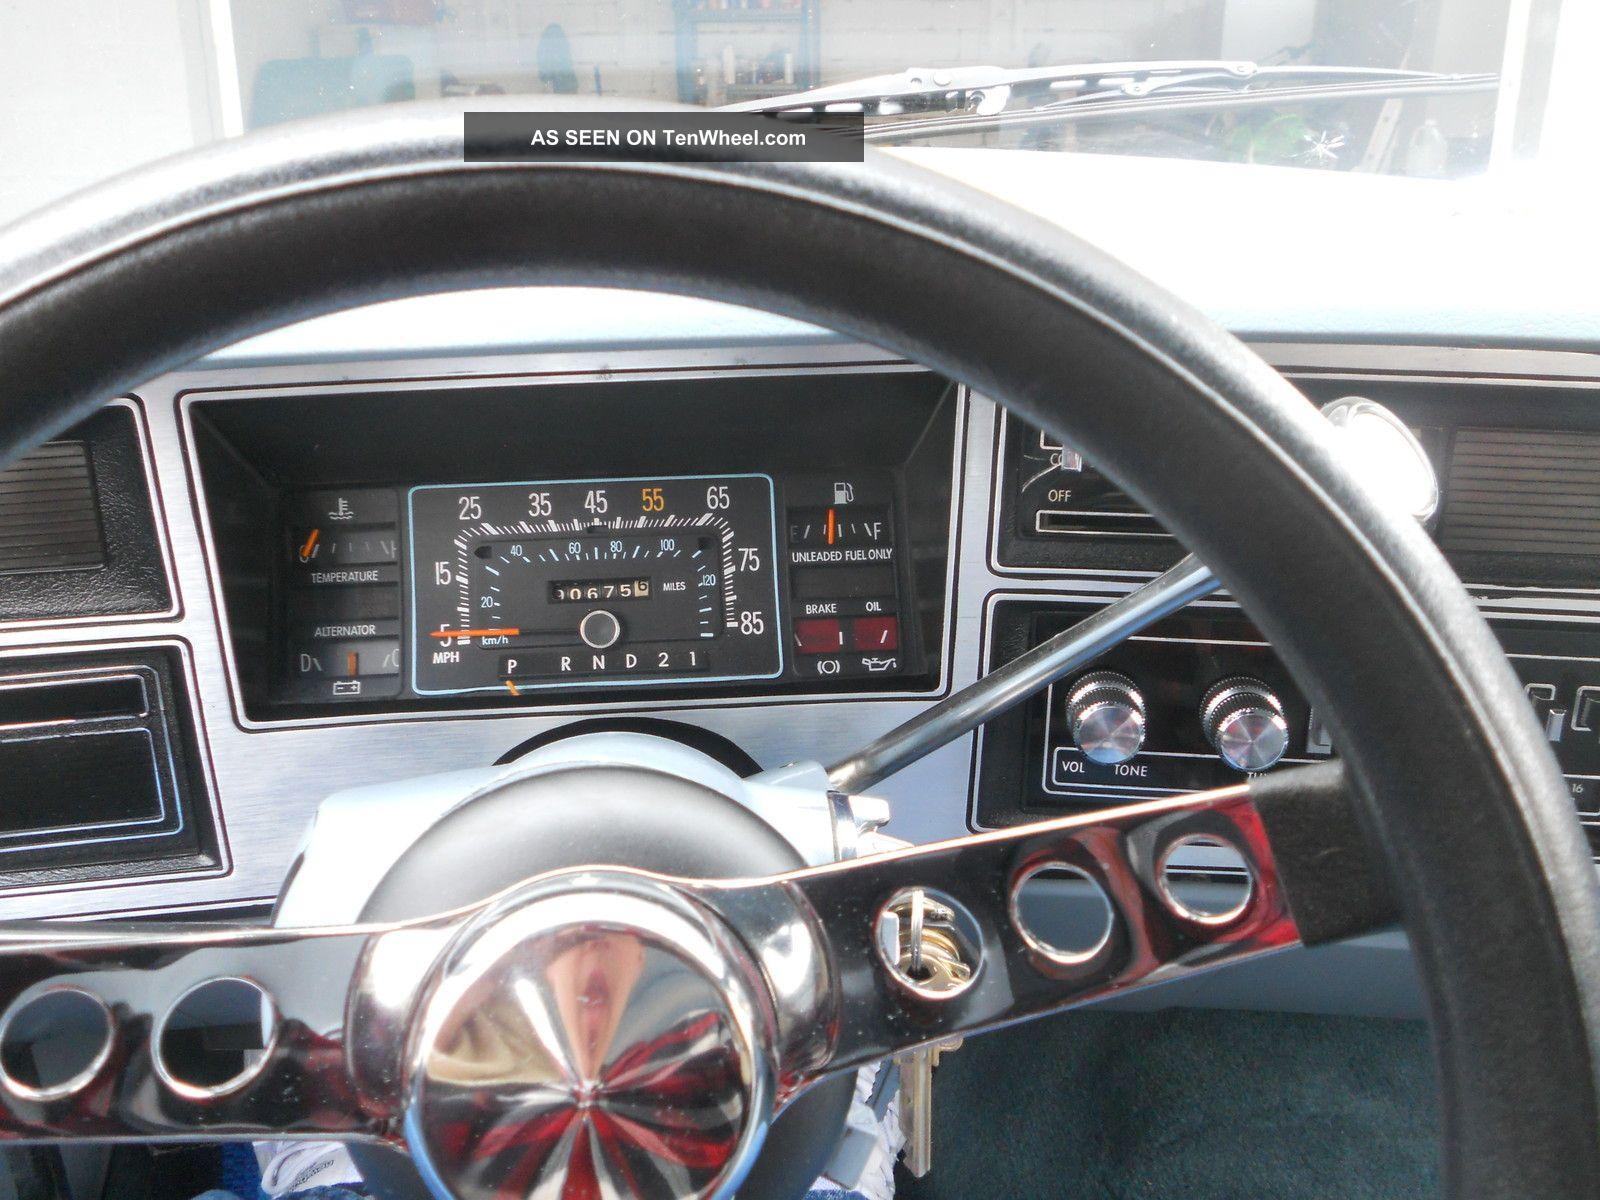 80volaresedan 1980 Plymouth Volare Specs, Photos ...  |1980 Plymouth Volare Interior